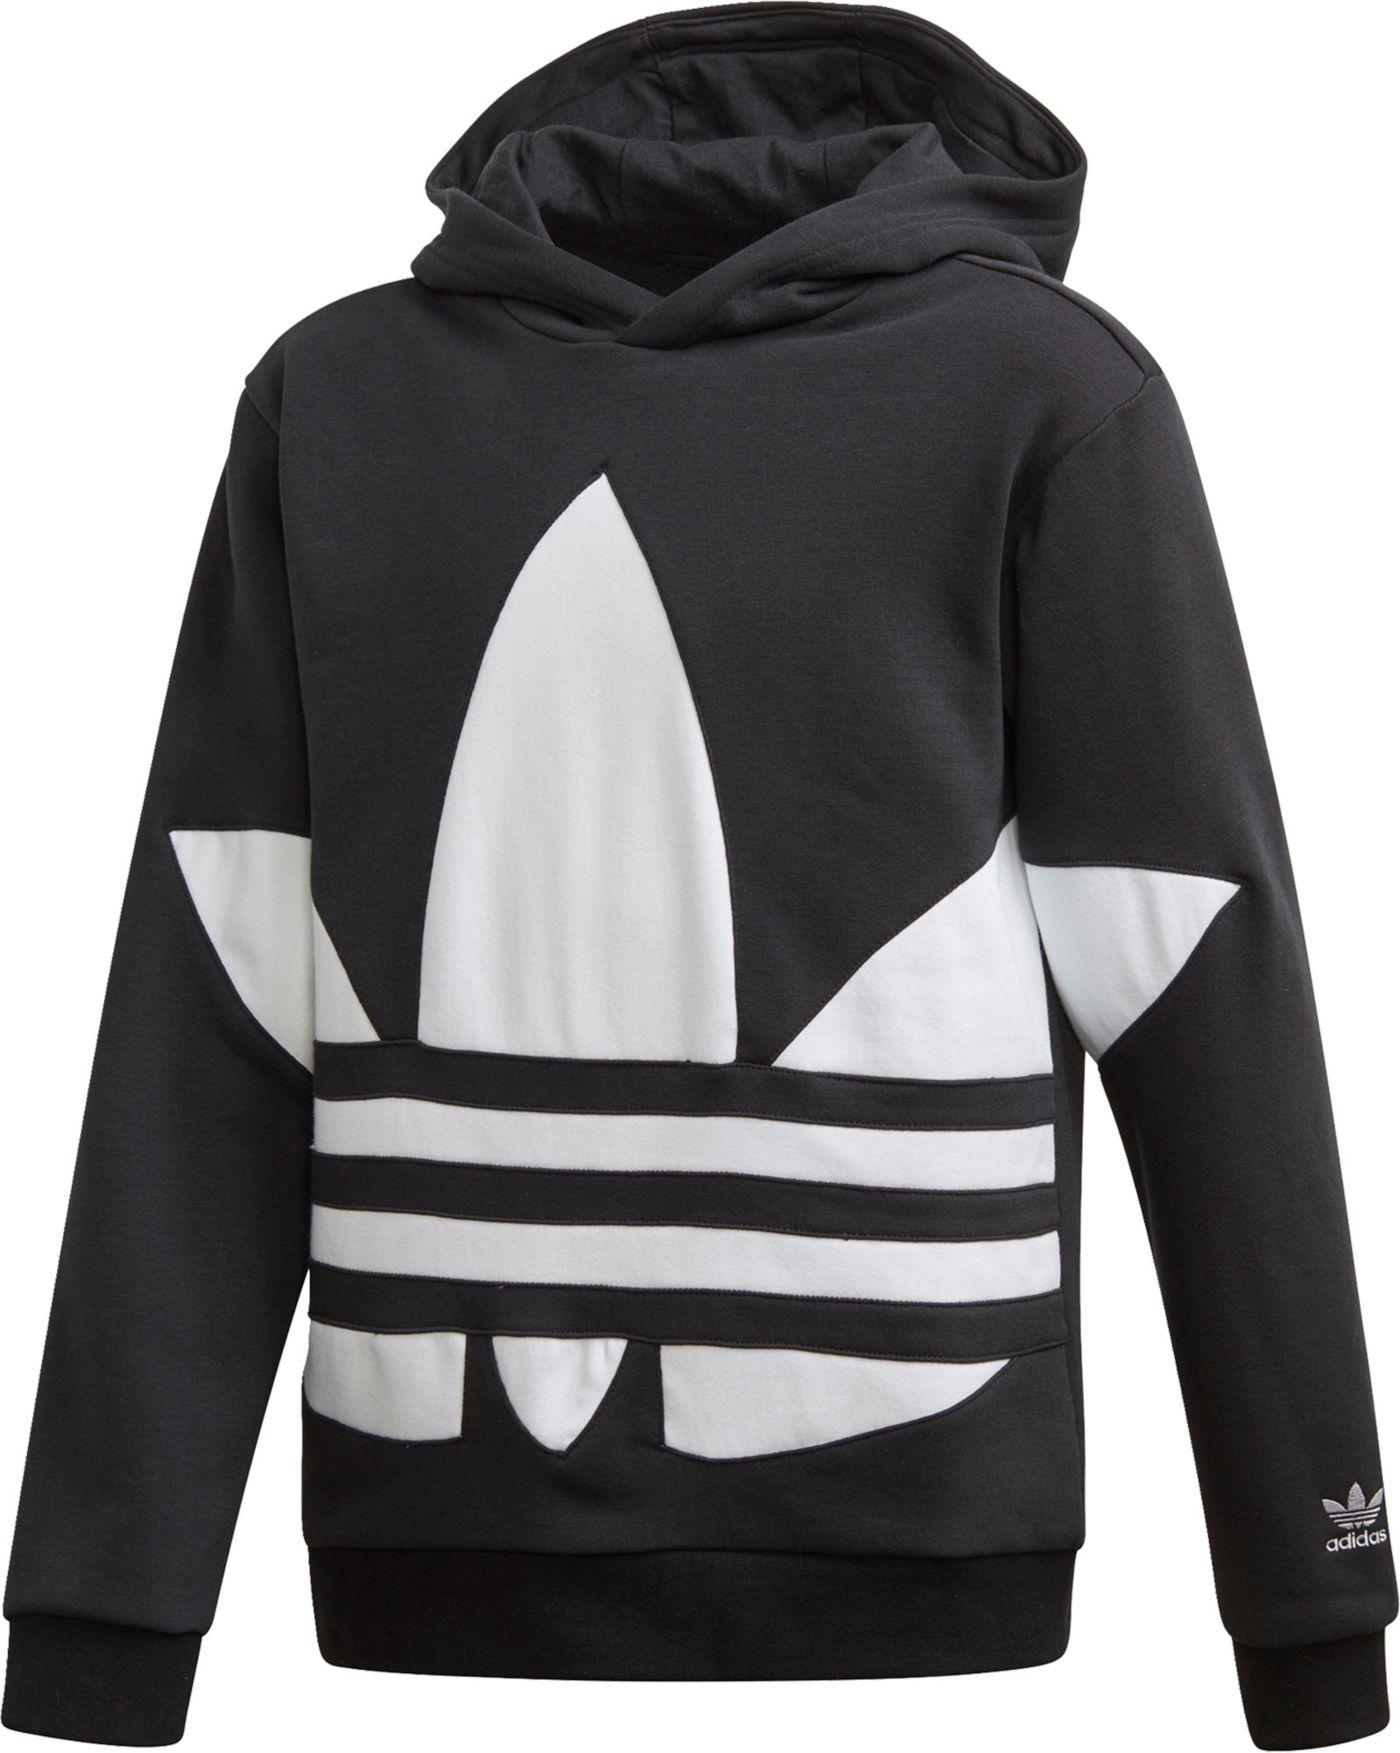 adidas Originals Boys' Big Trefoil Hoodie